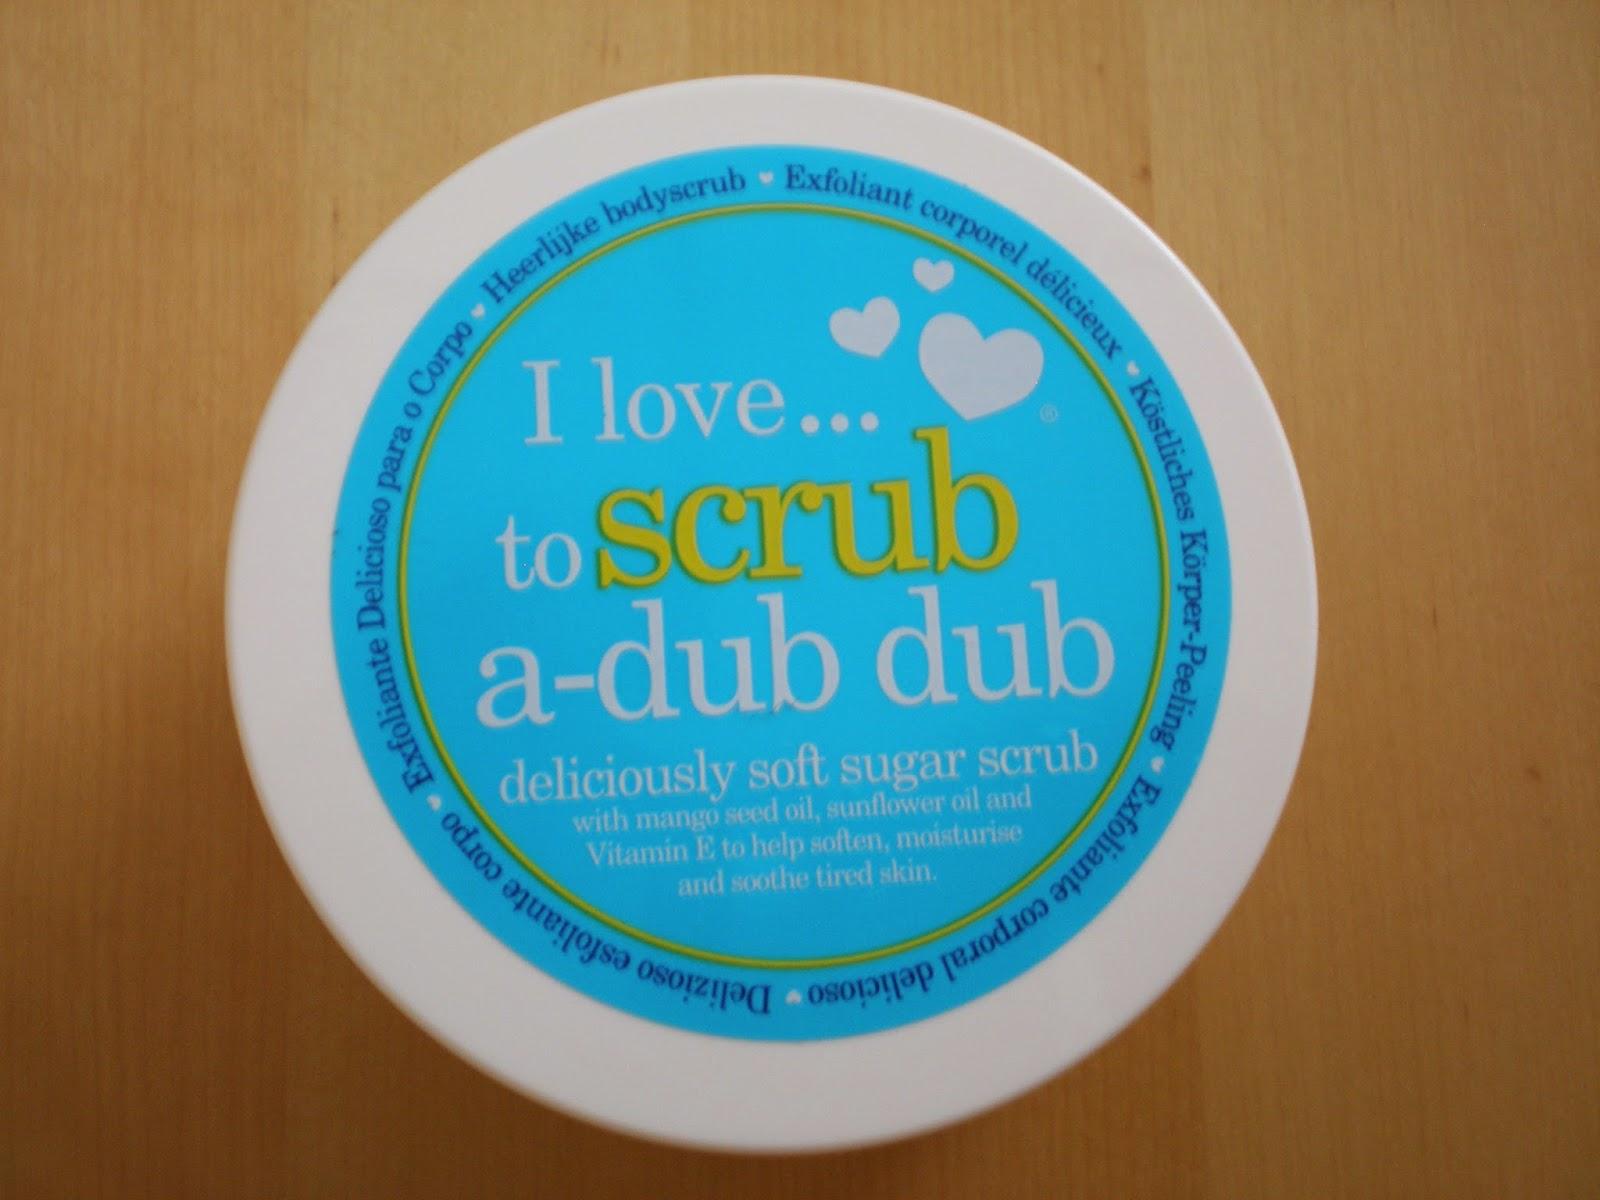 I LOVE ...Spa Line Deliciously Soft Sugar Scrub